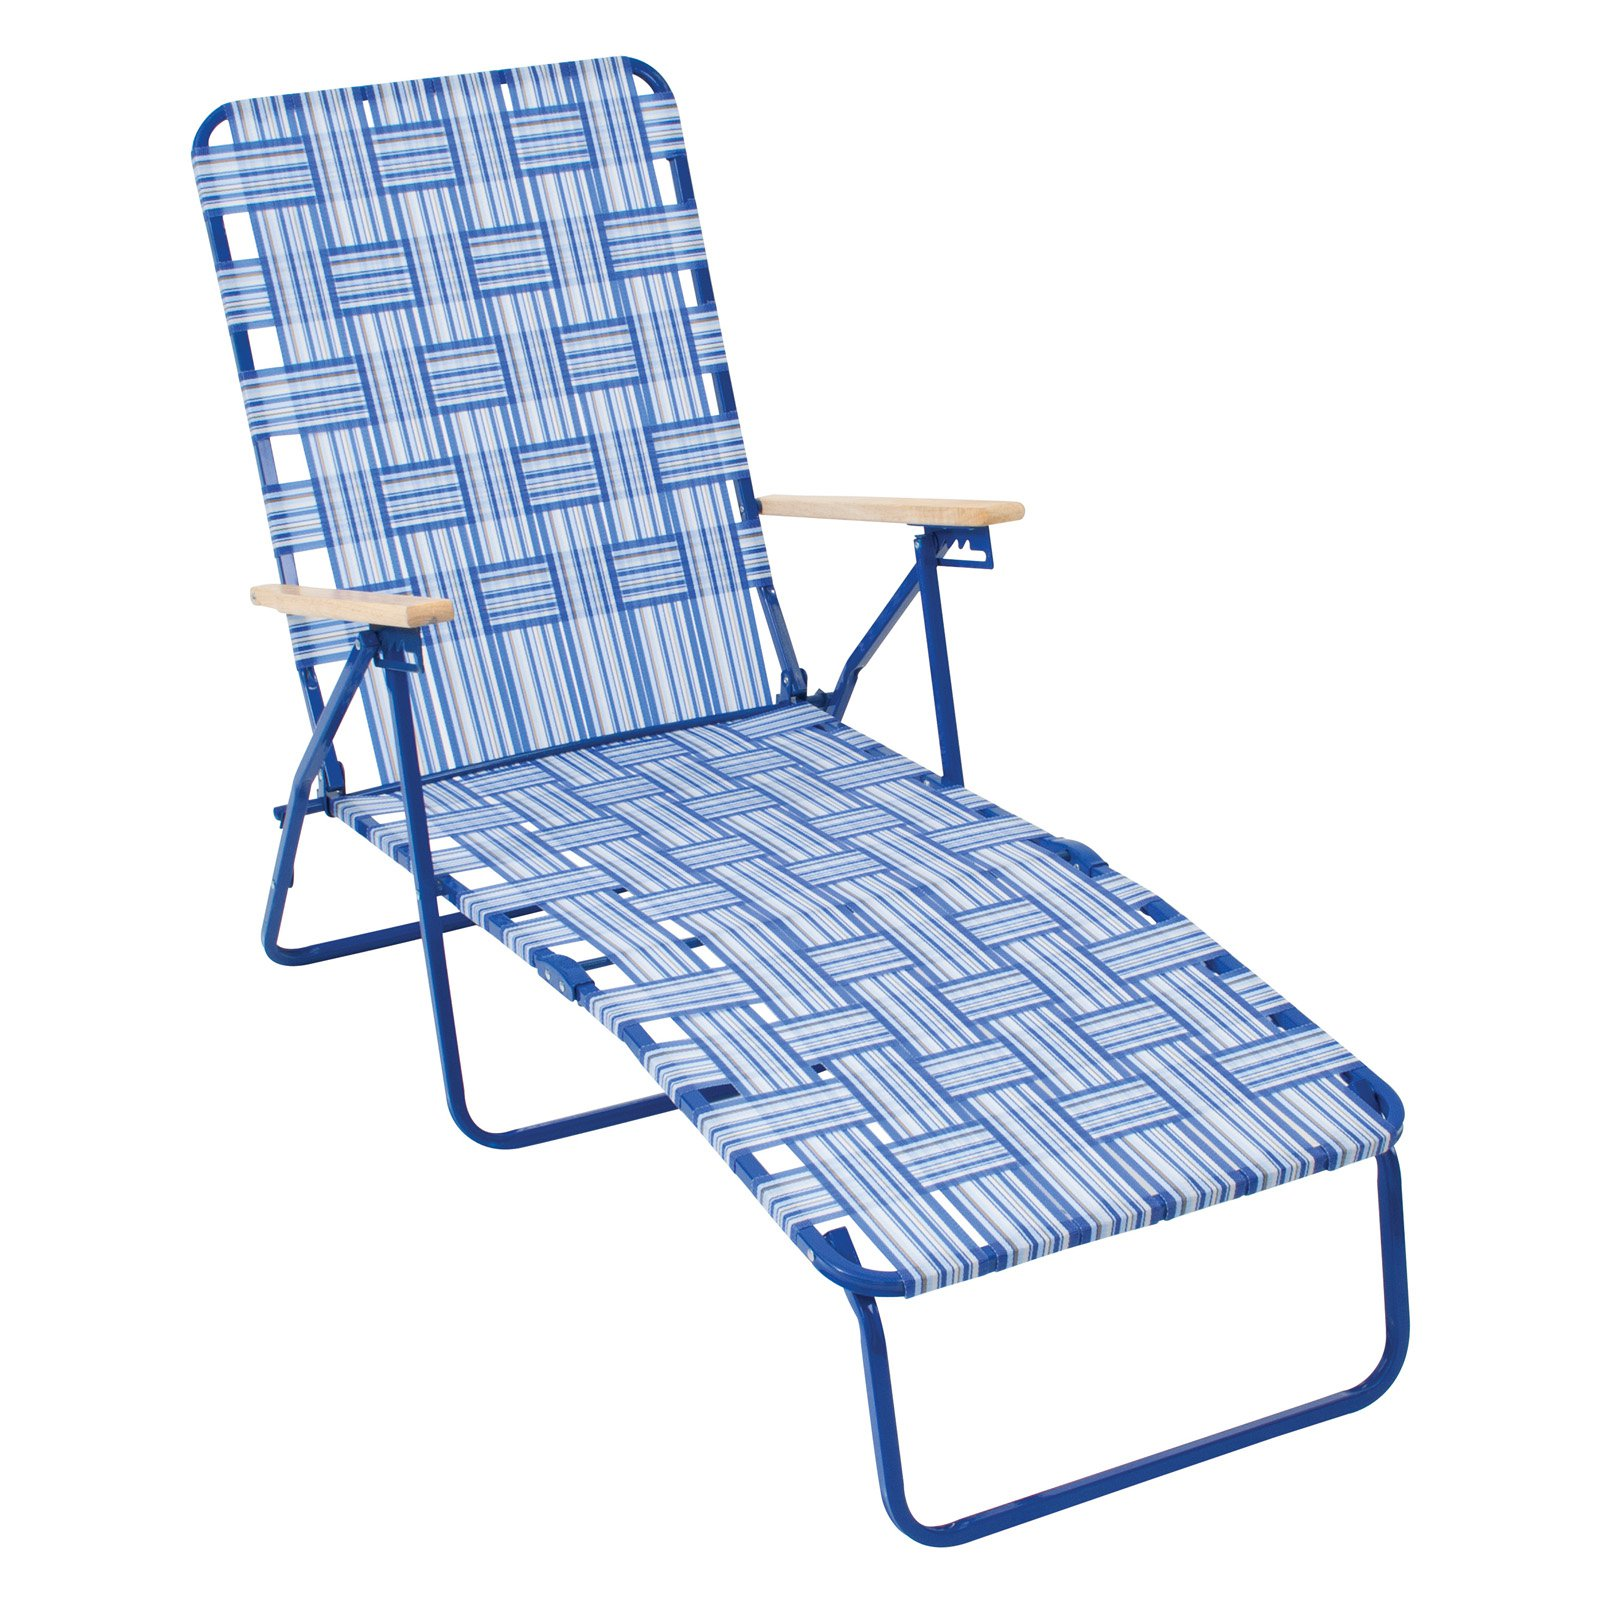 Outdoor Rio Brands Rio Deluxe Folding Web Chaise Lounge